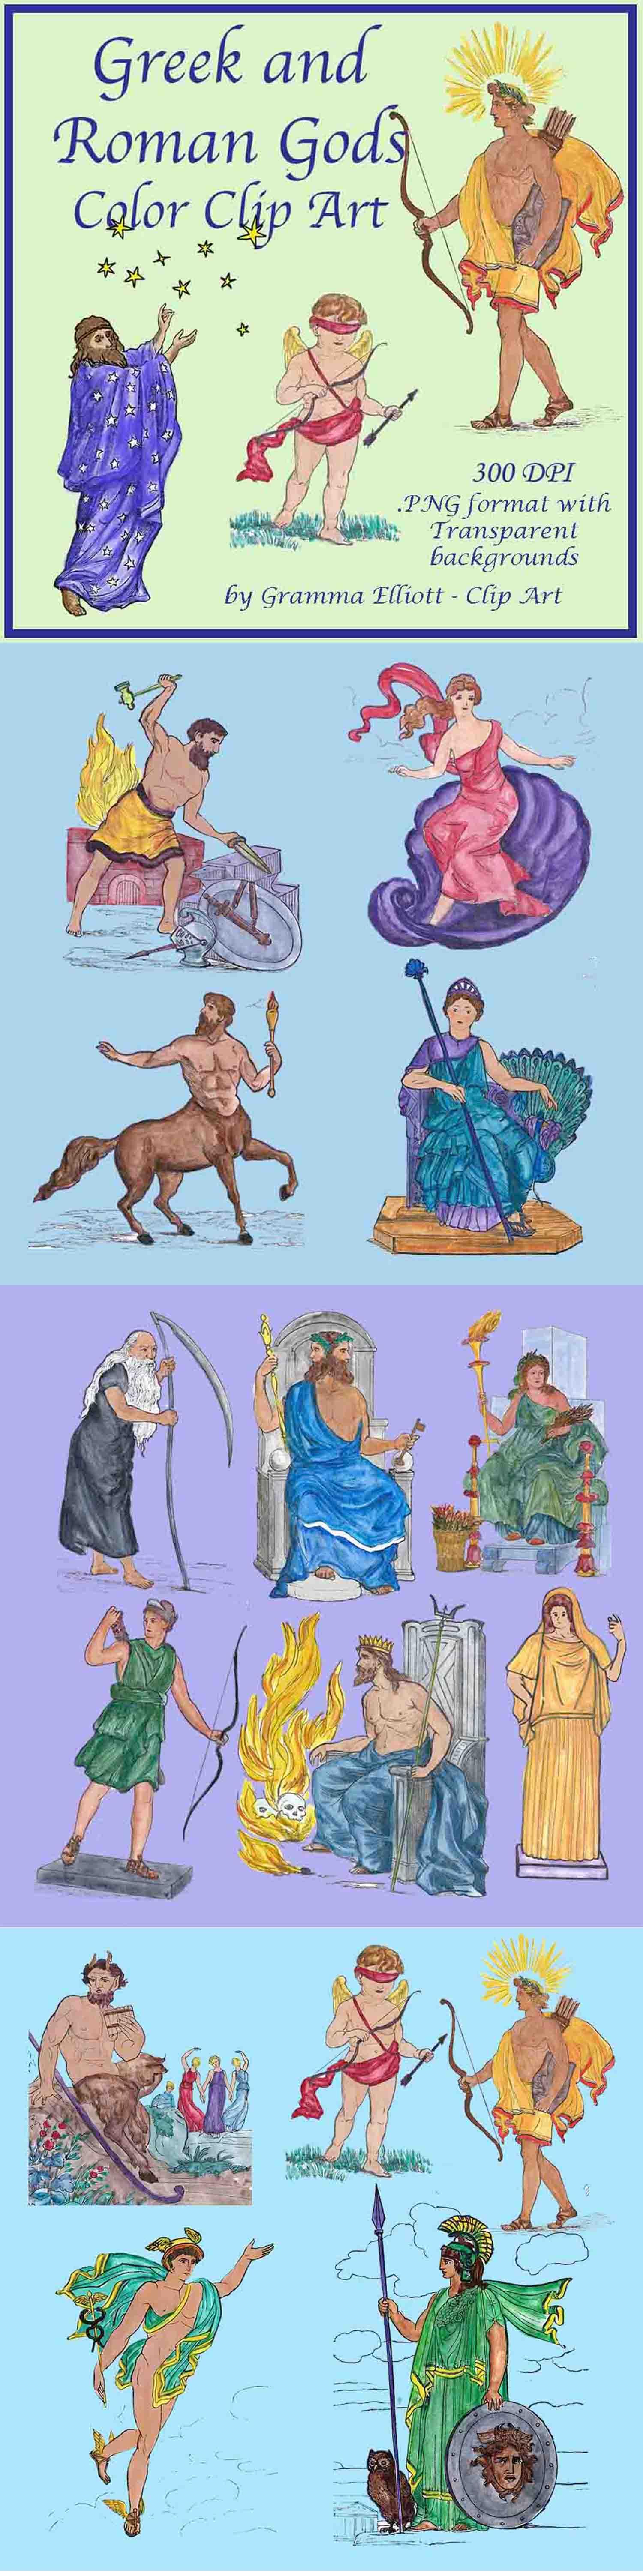 Africa clipart gods. Greek and roman mythology